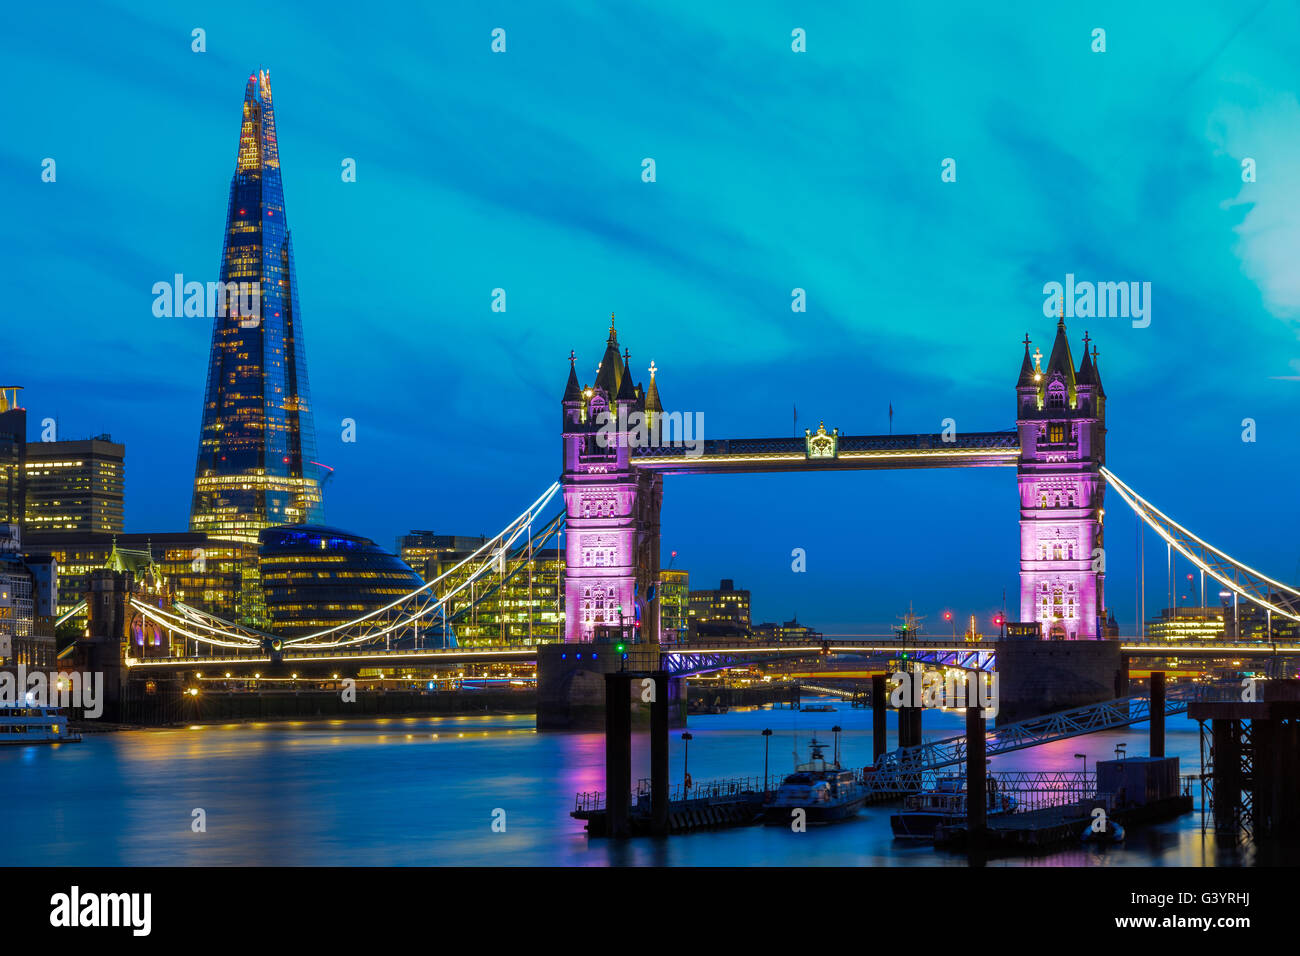 London skyline at night with Tower Bridge - Stock Image